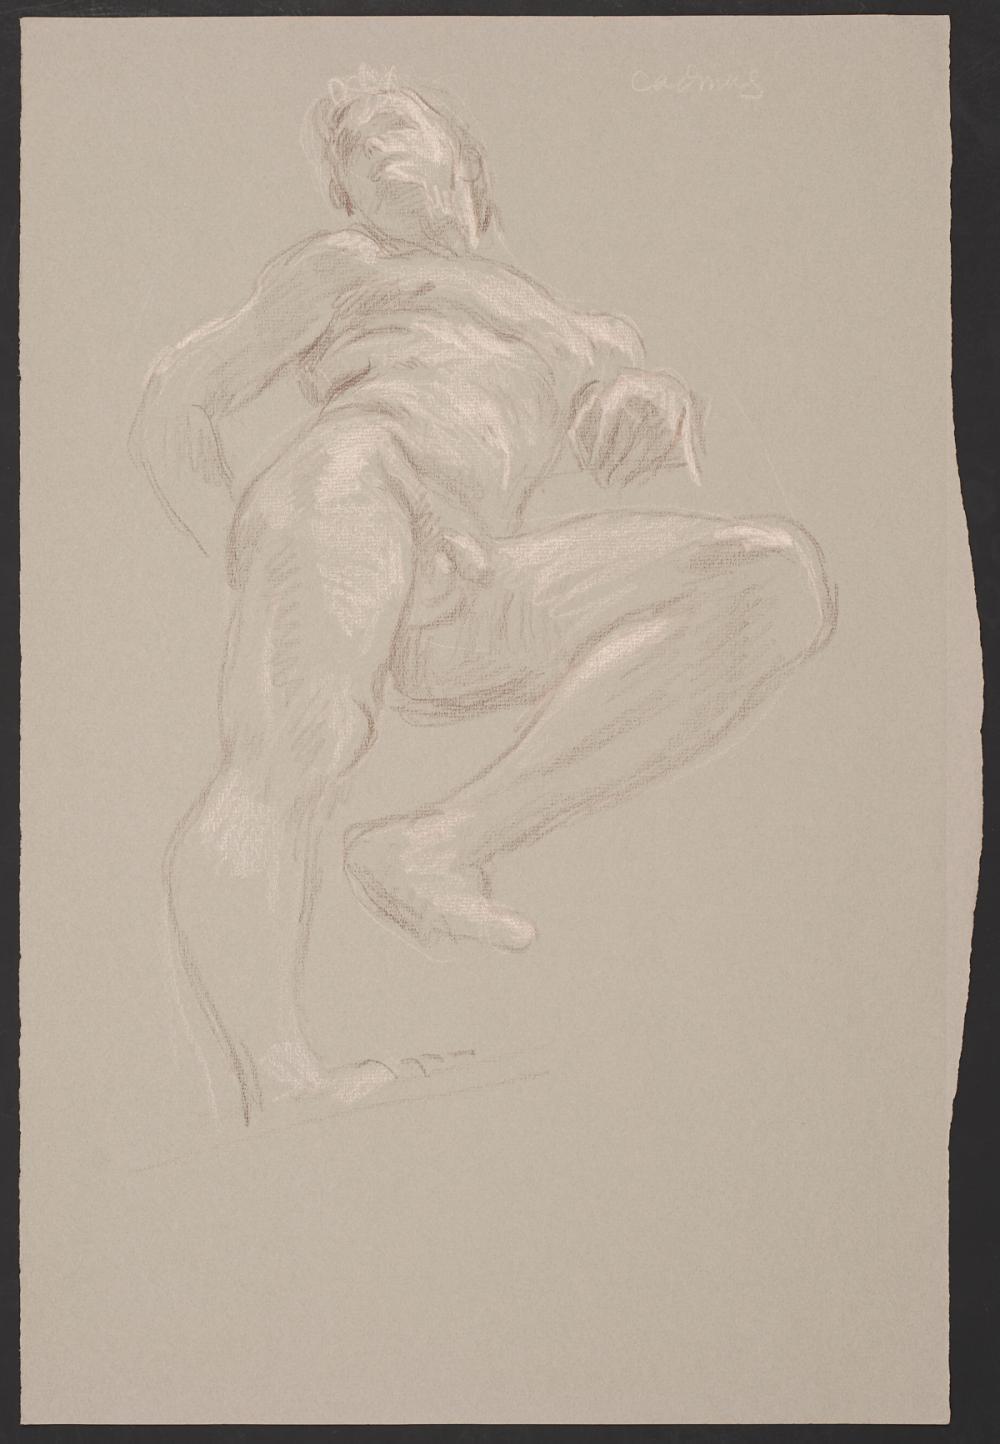 Paul Cadmus Male Nude Crayon on Paper